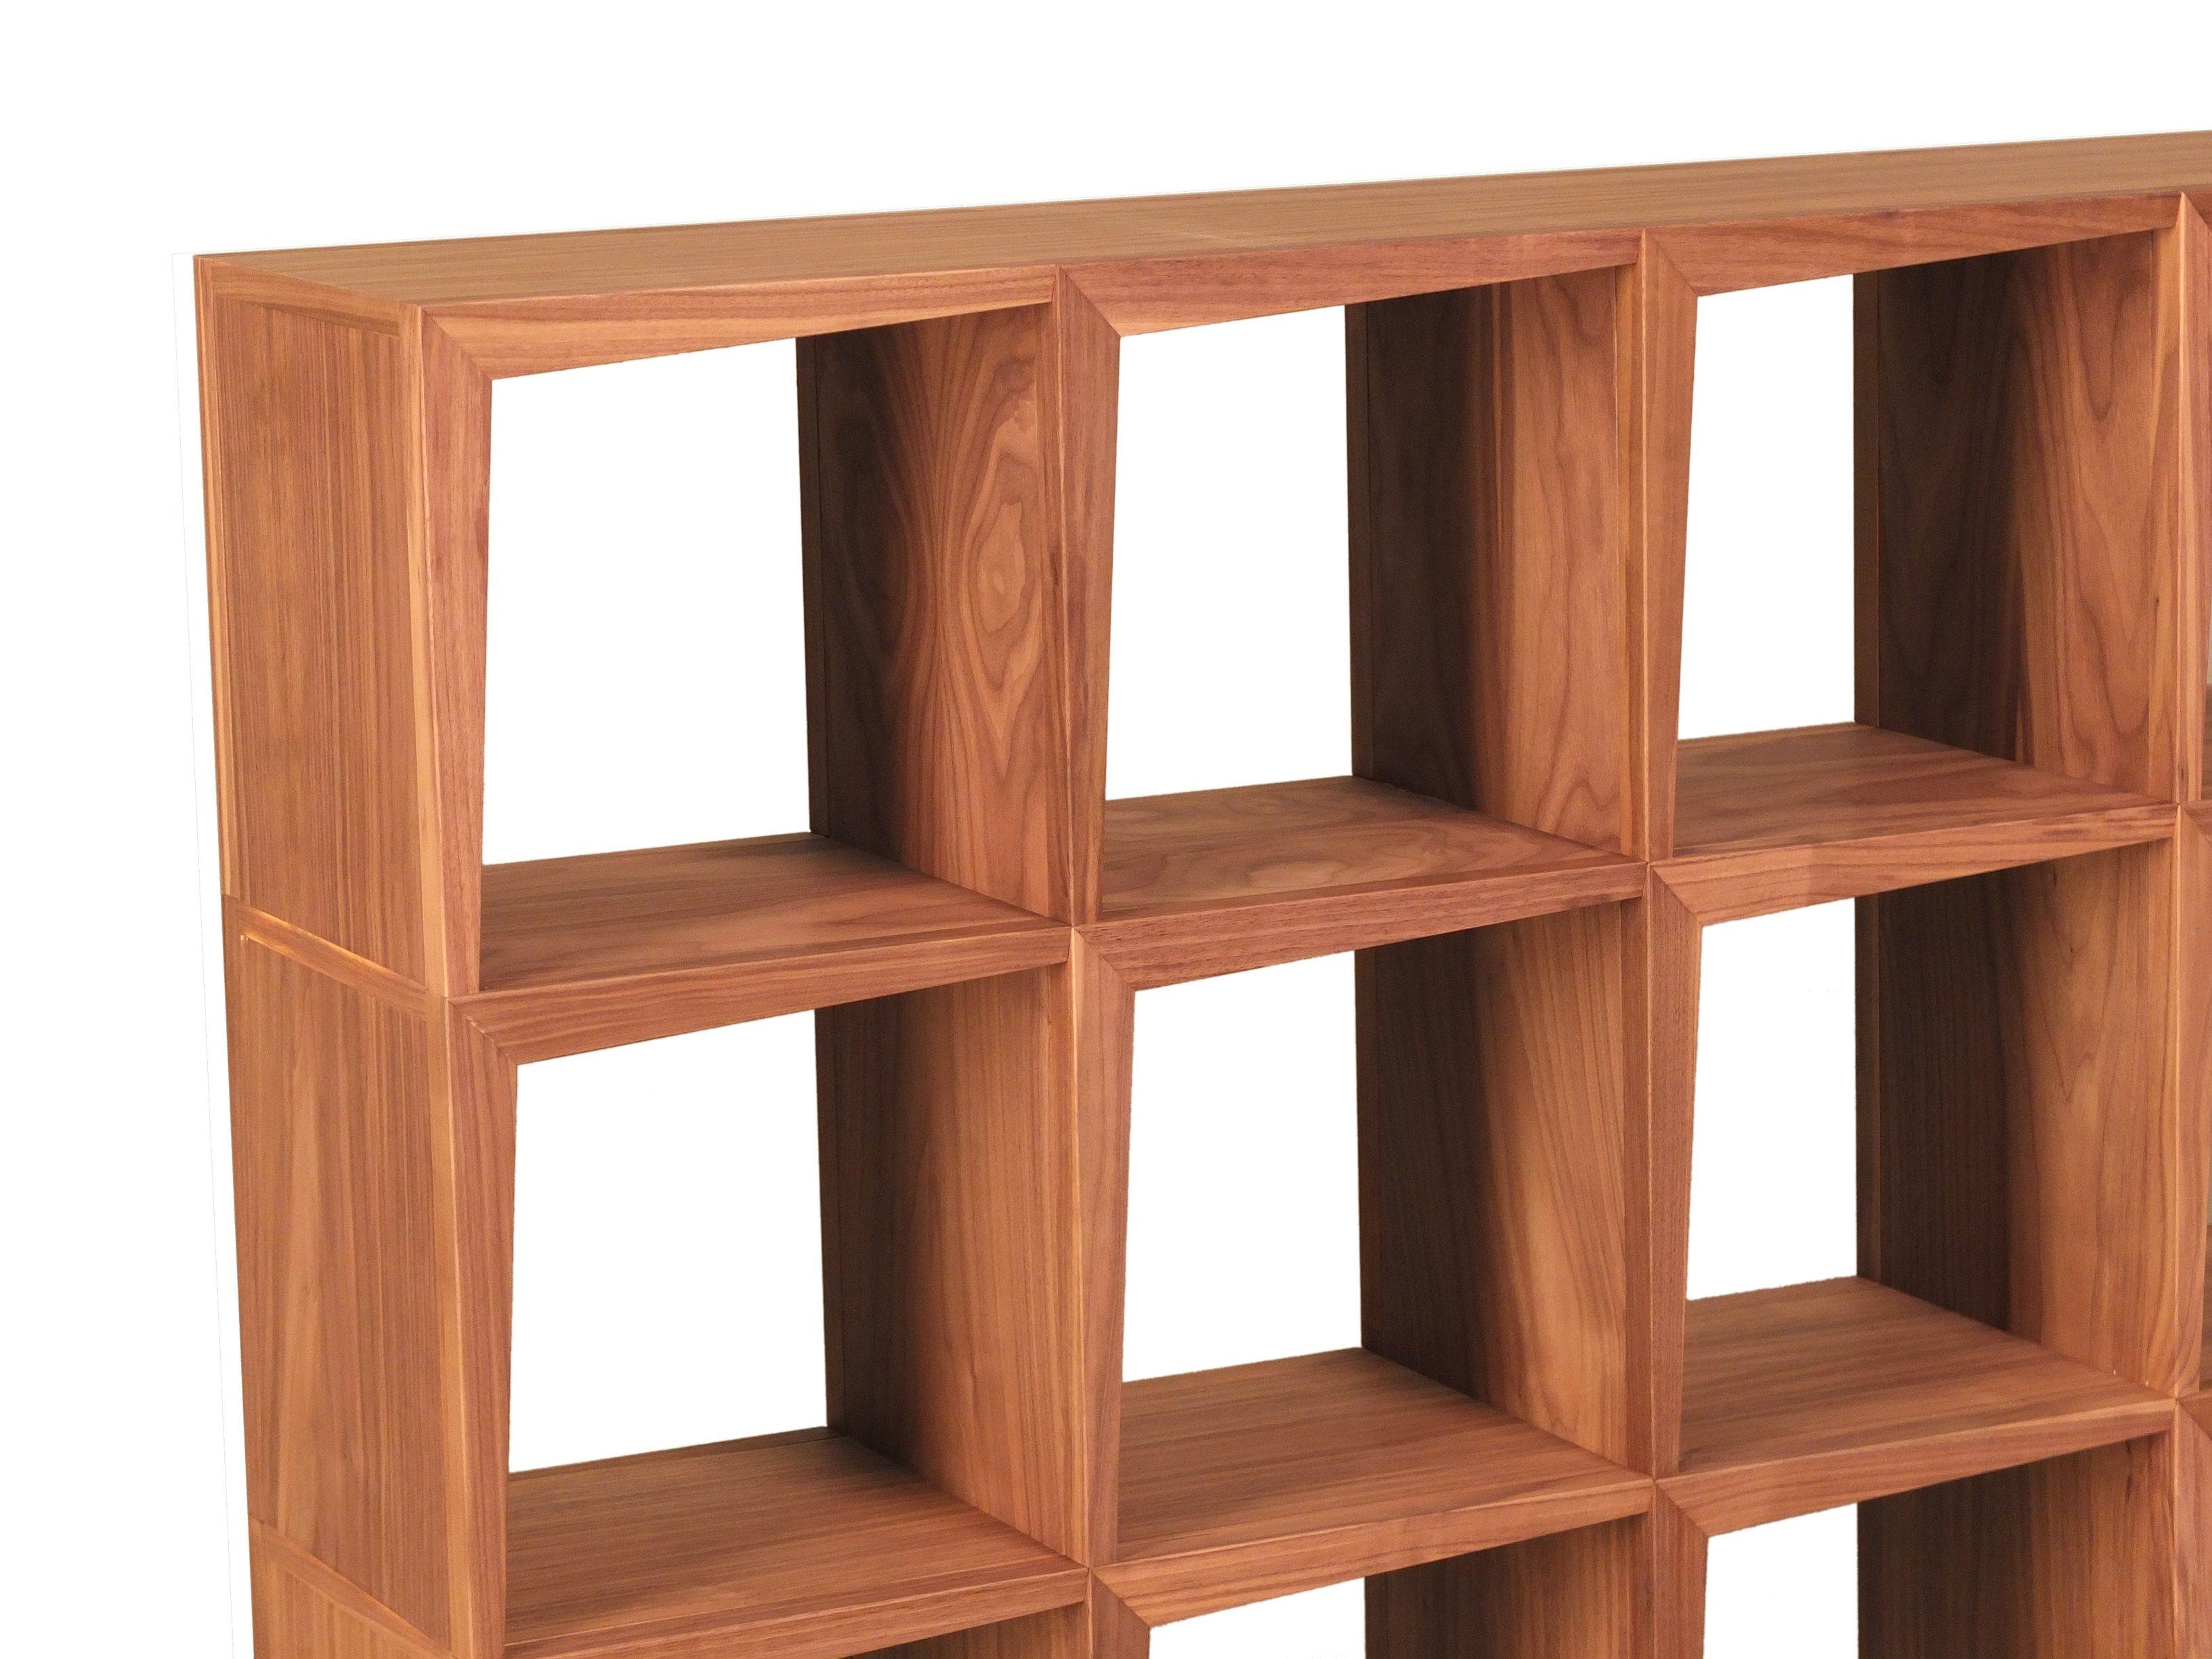 kant  bookcase by morelato design itamar harari -